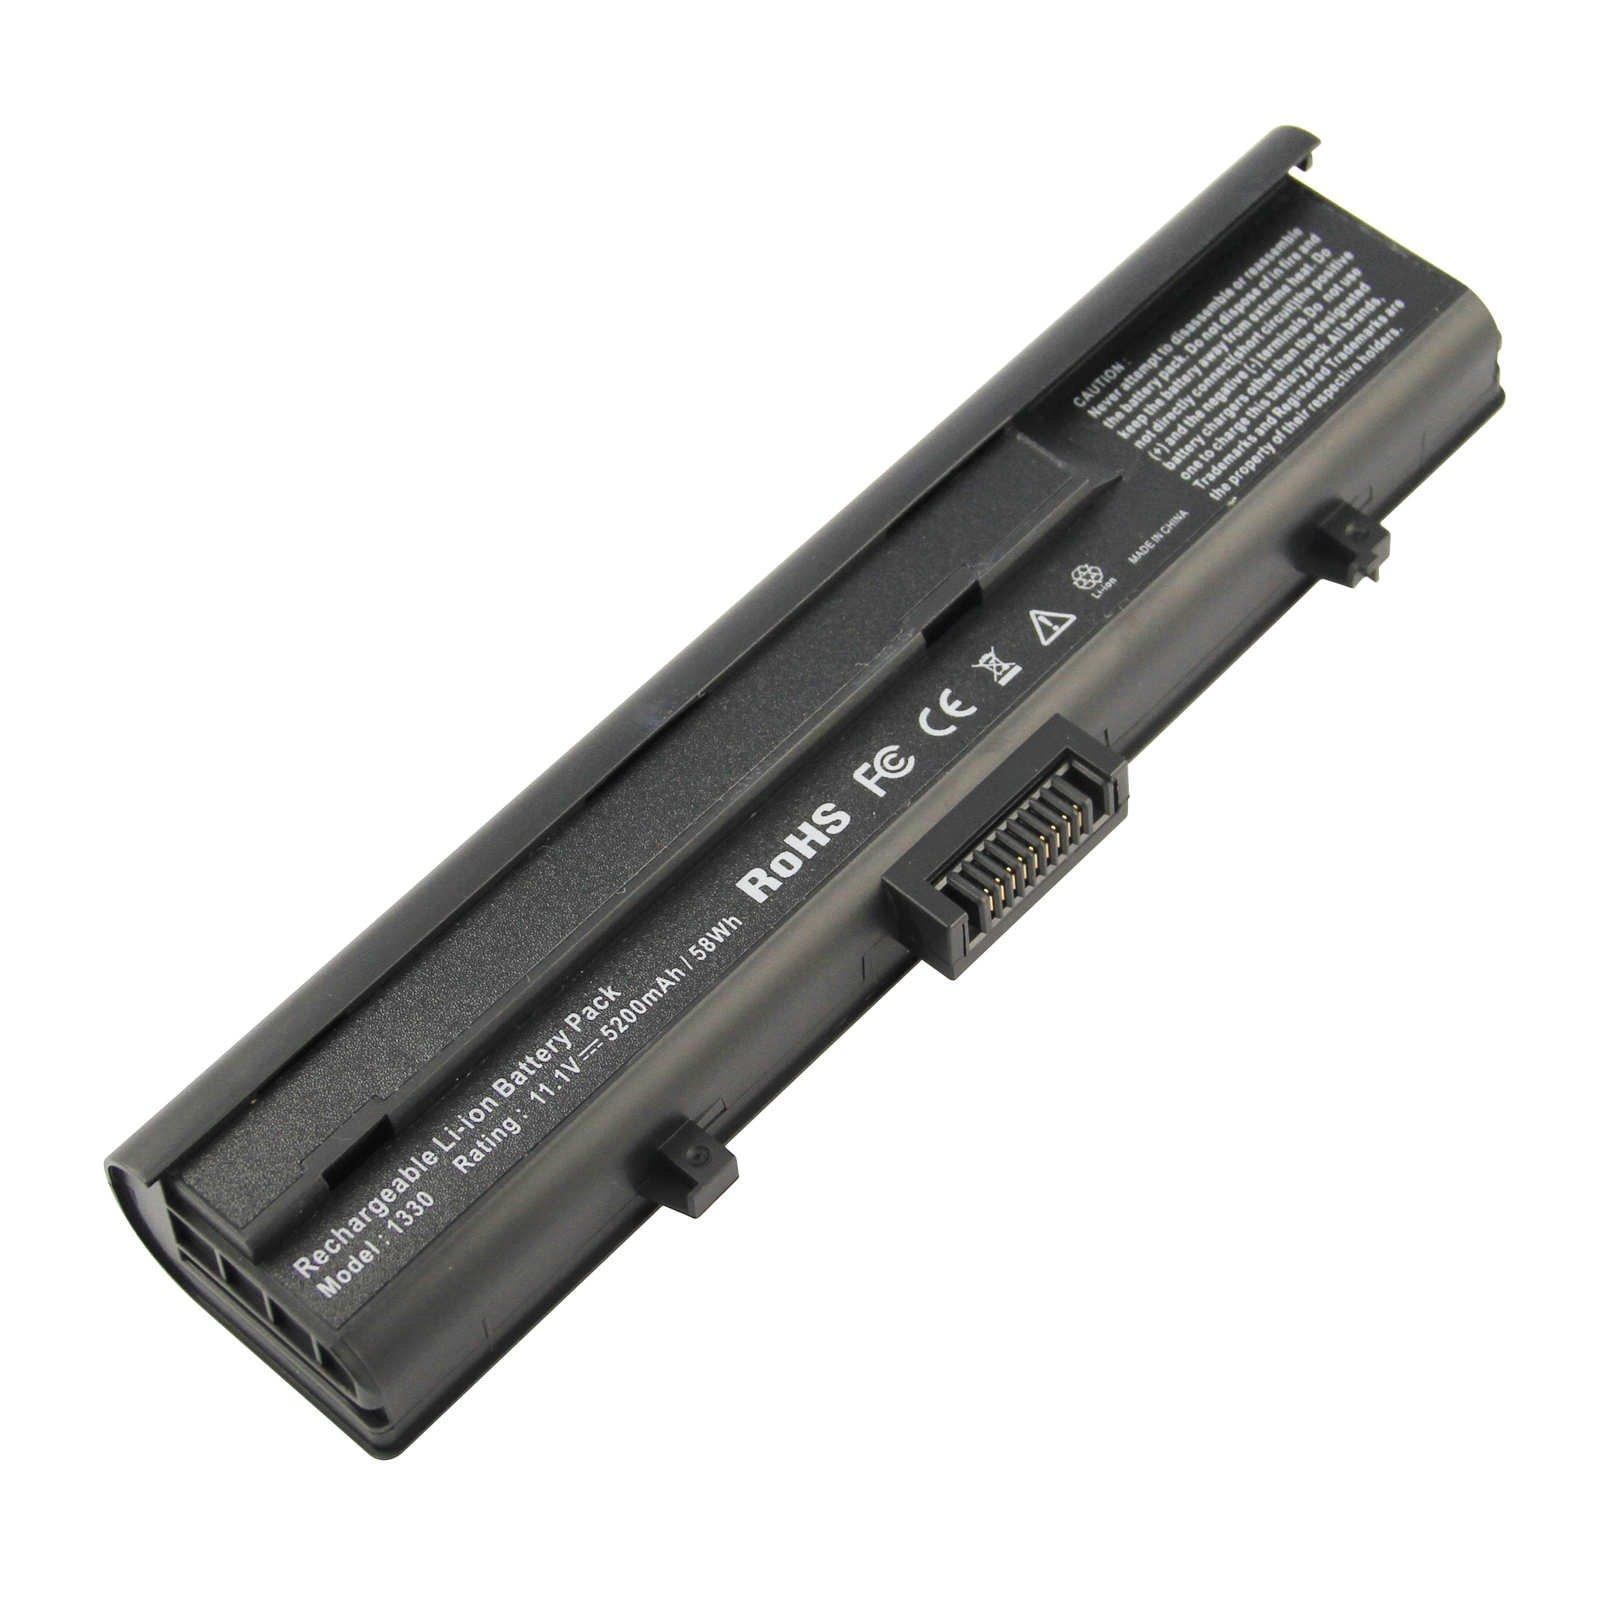 Bateria M1330 para Dell Inspiron 13 1318 1318N Xps M1330 PU556 NT349 5200mAh 11.1V